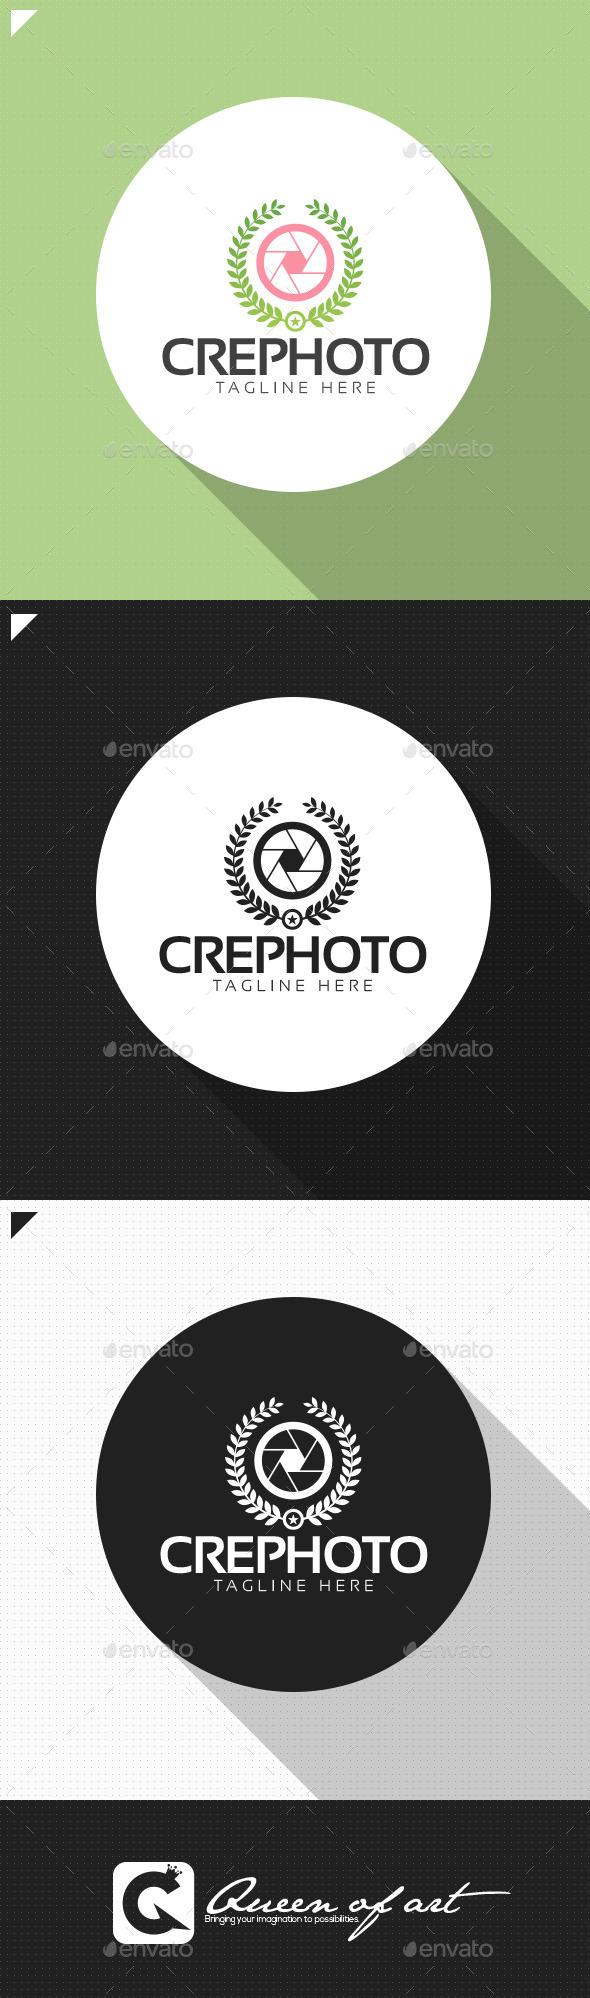 GraphicRiver Crephoto Logo 11778849